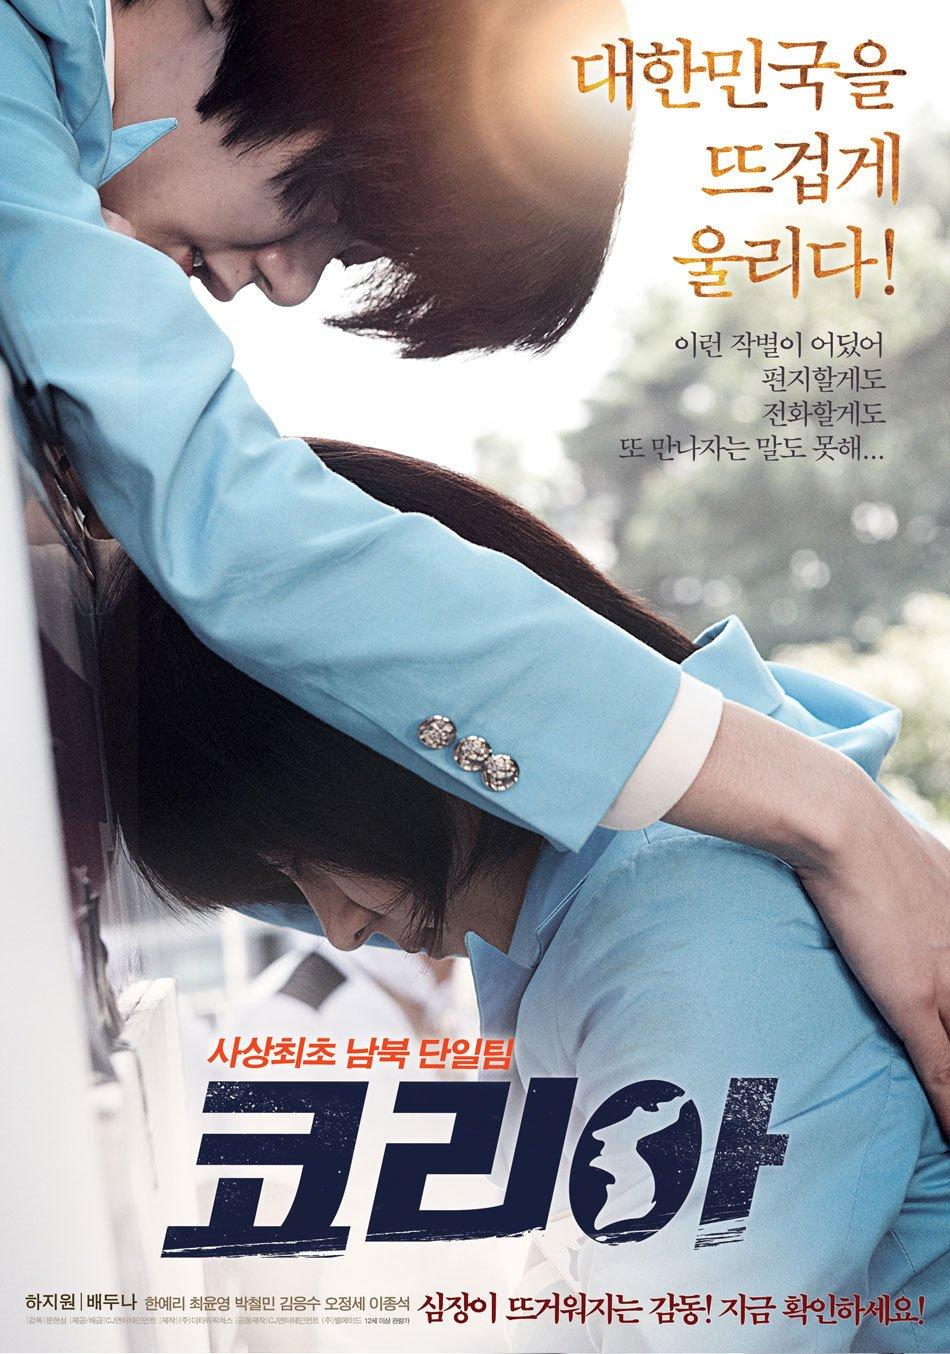 Modern Korean Cinema Korean Box Office Update 05110513 2012